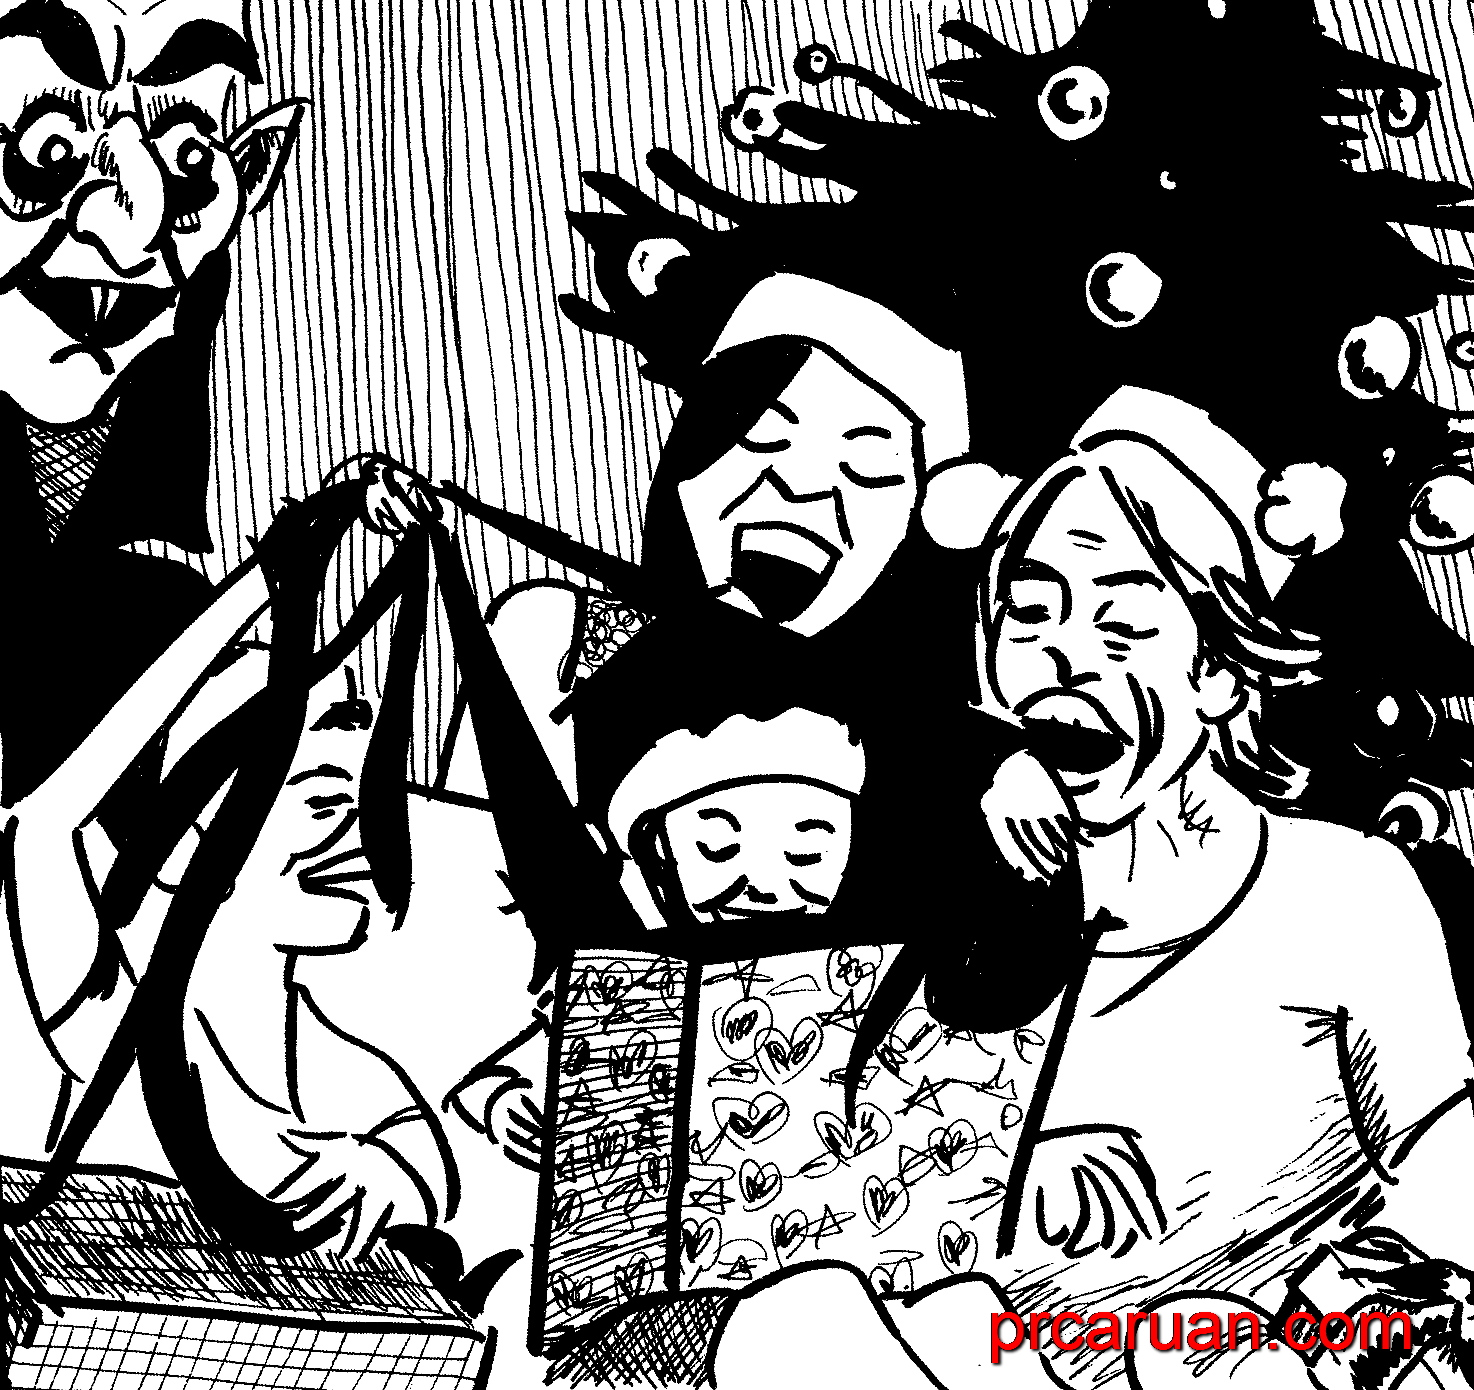 consumismo navideño